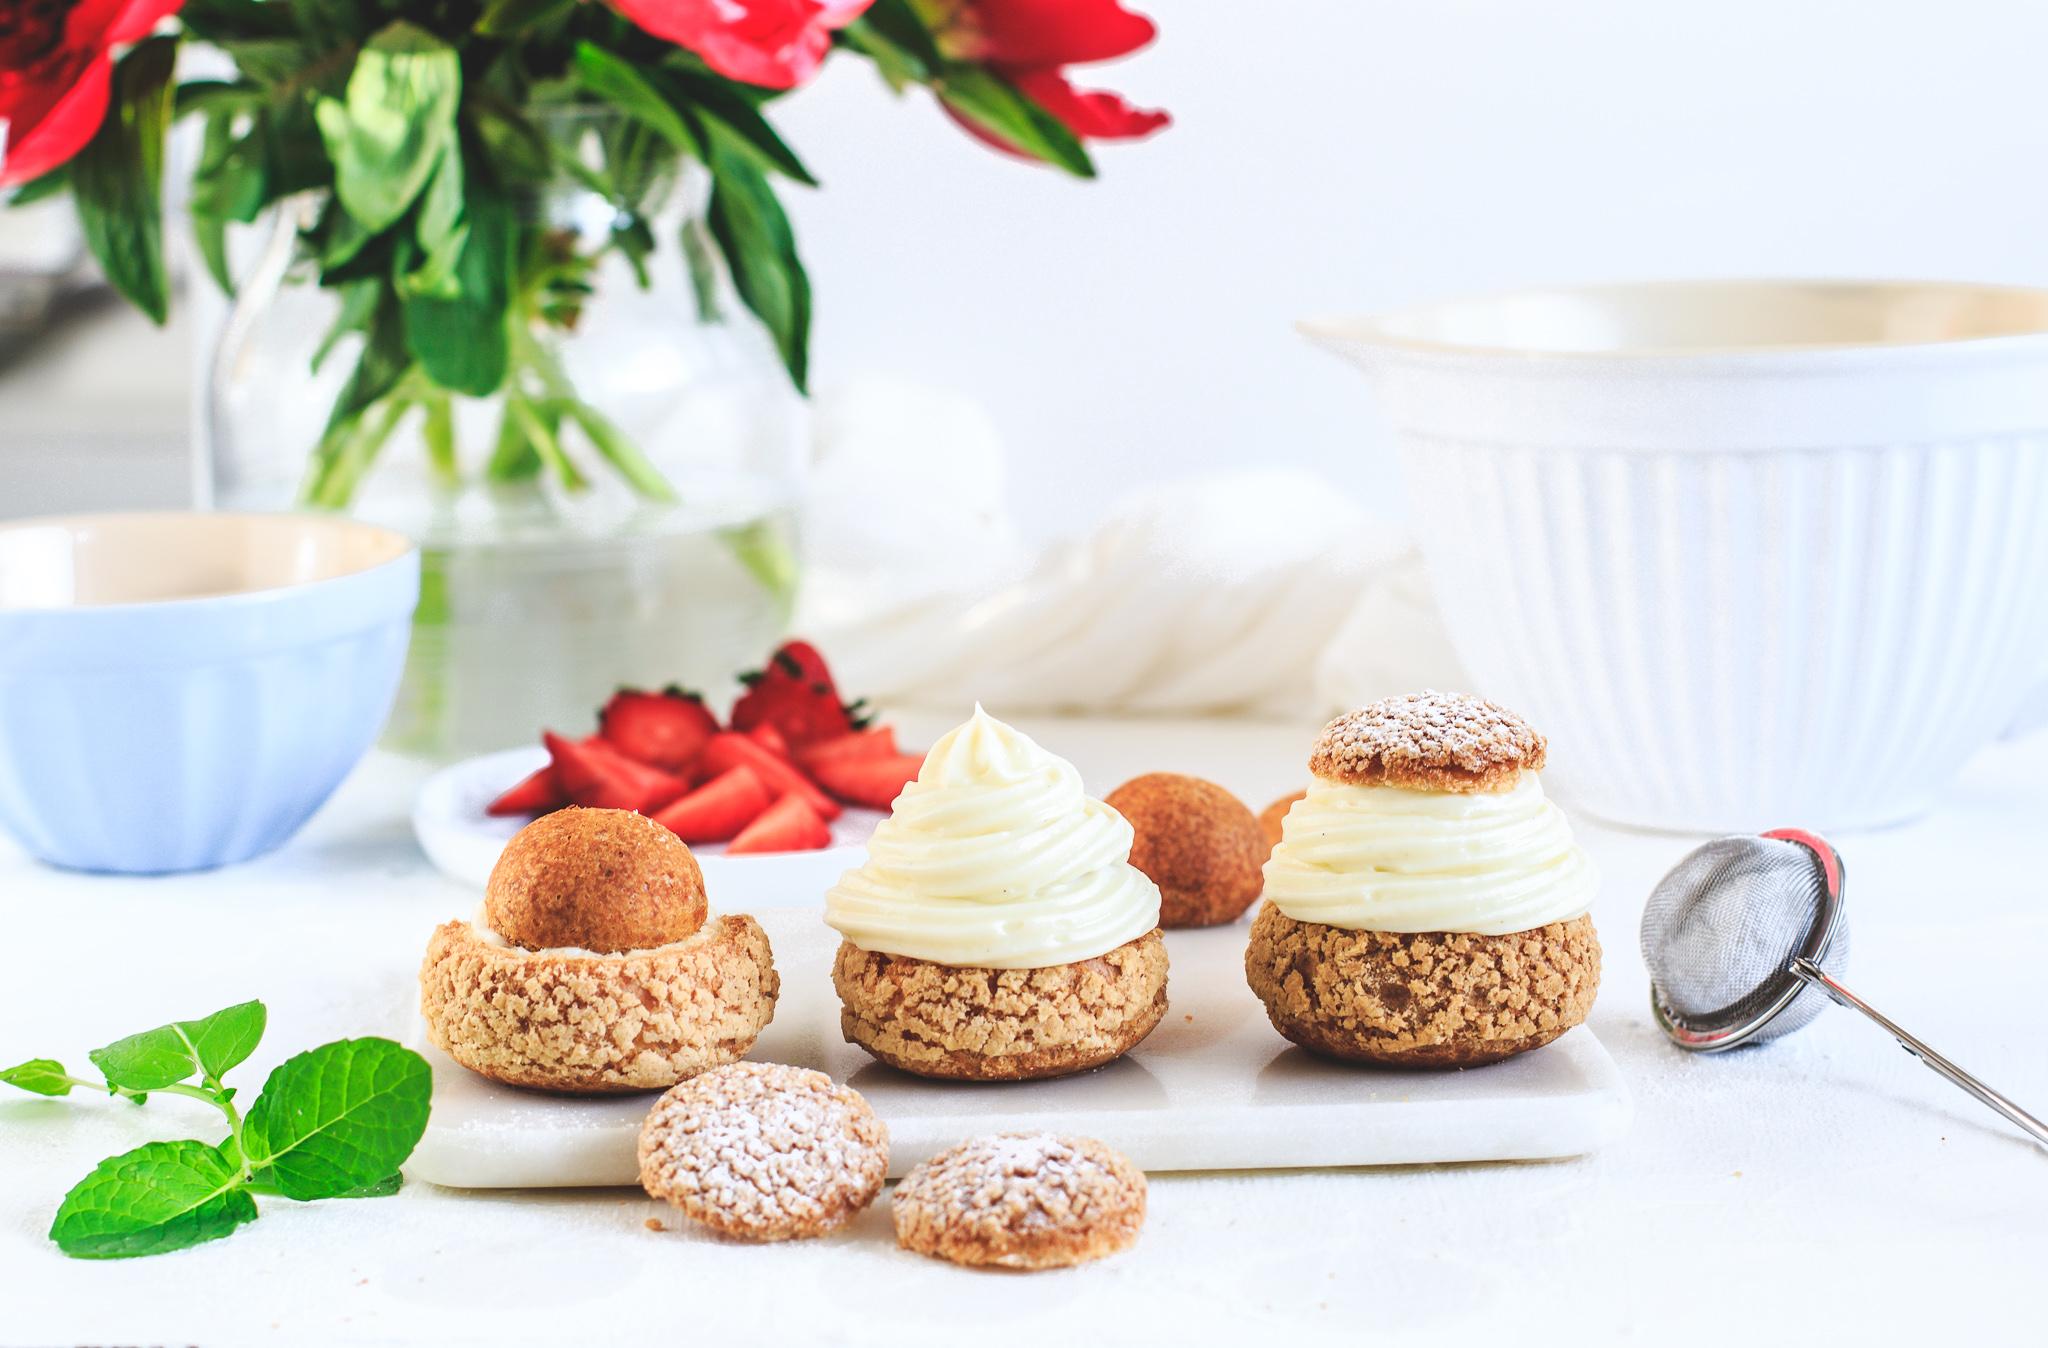 Jahodové choux s lehkým vanilkovým krémem a rebarborovým konfitem